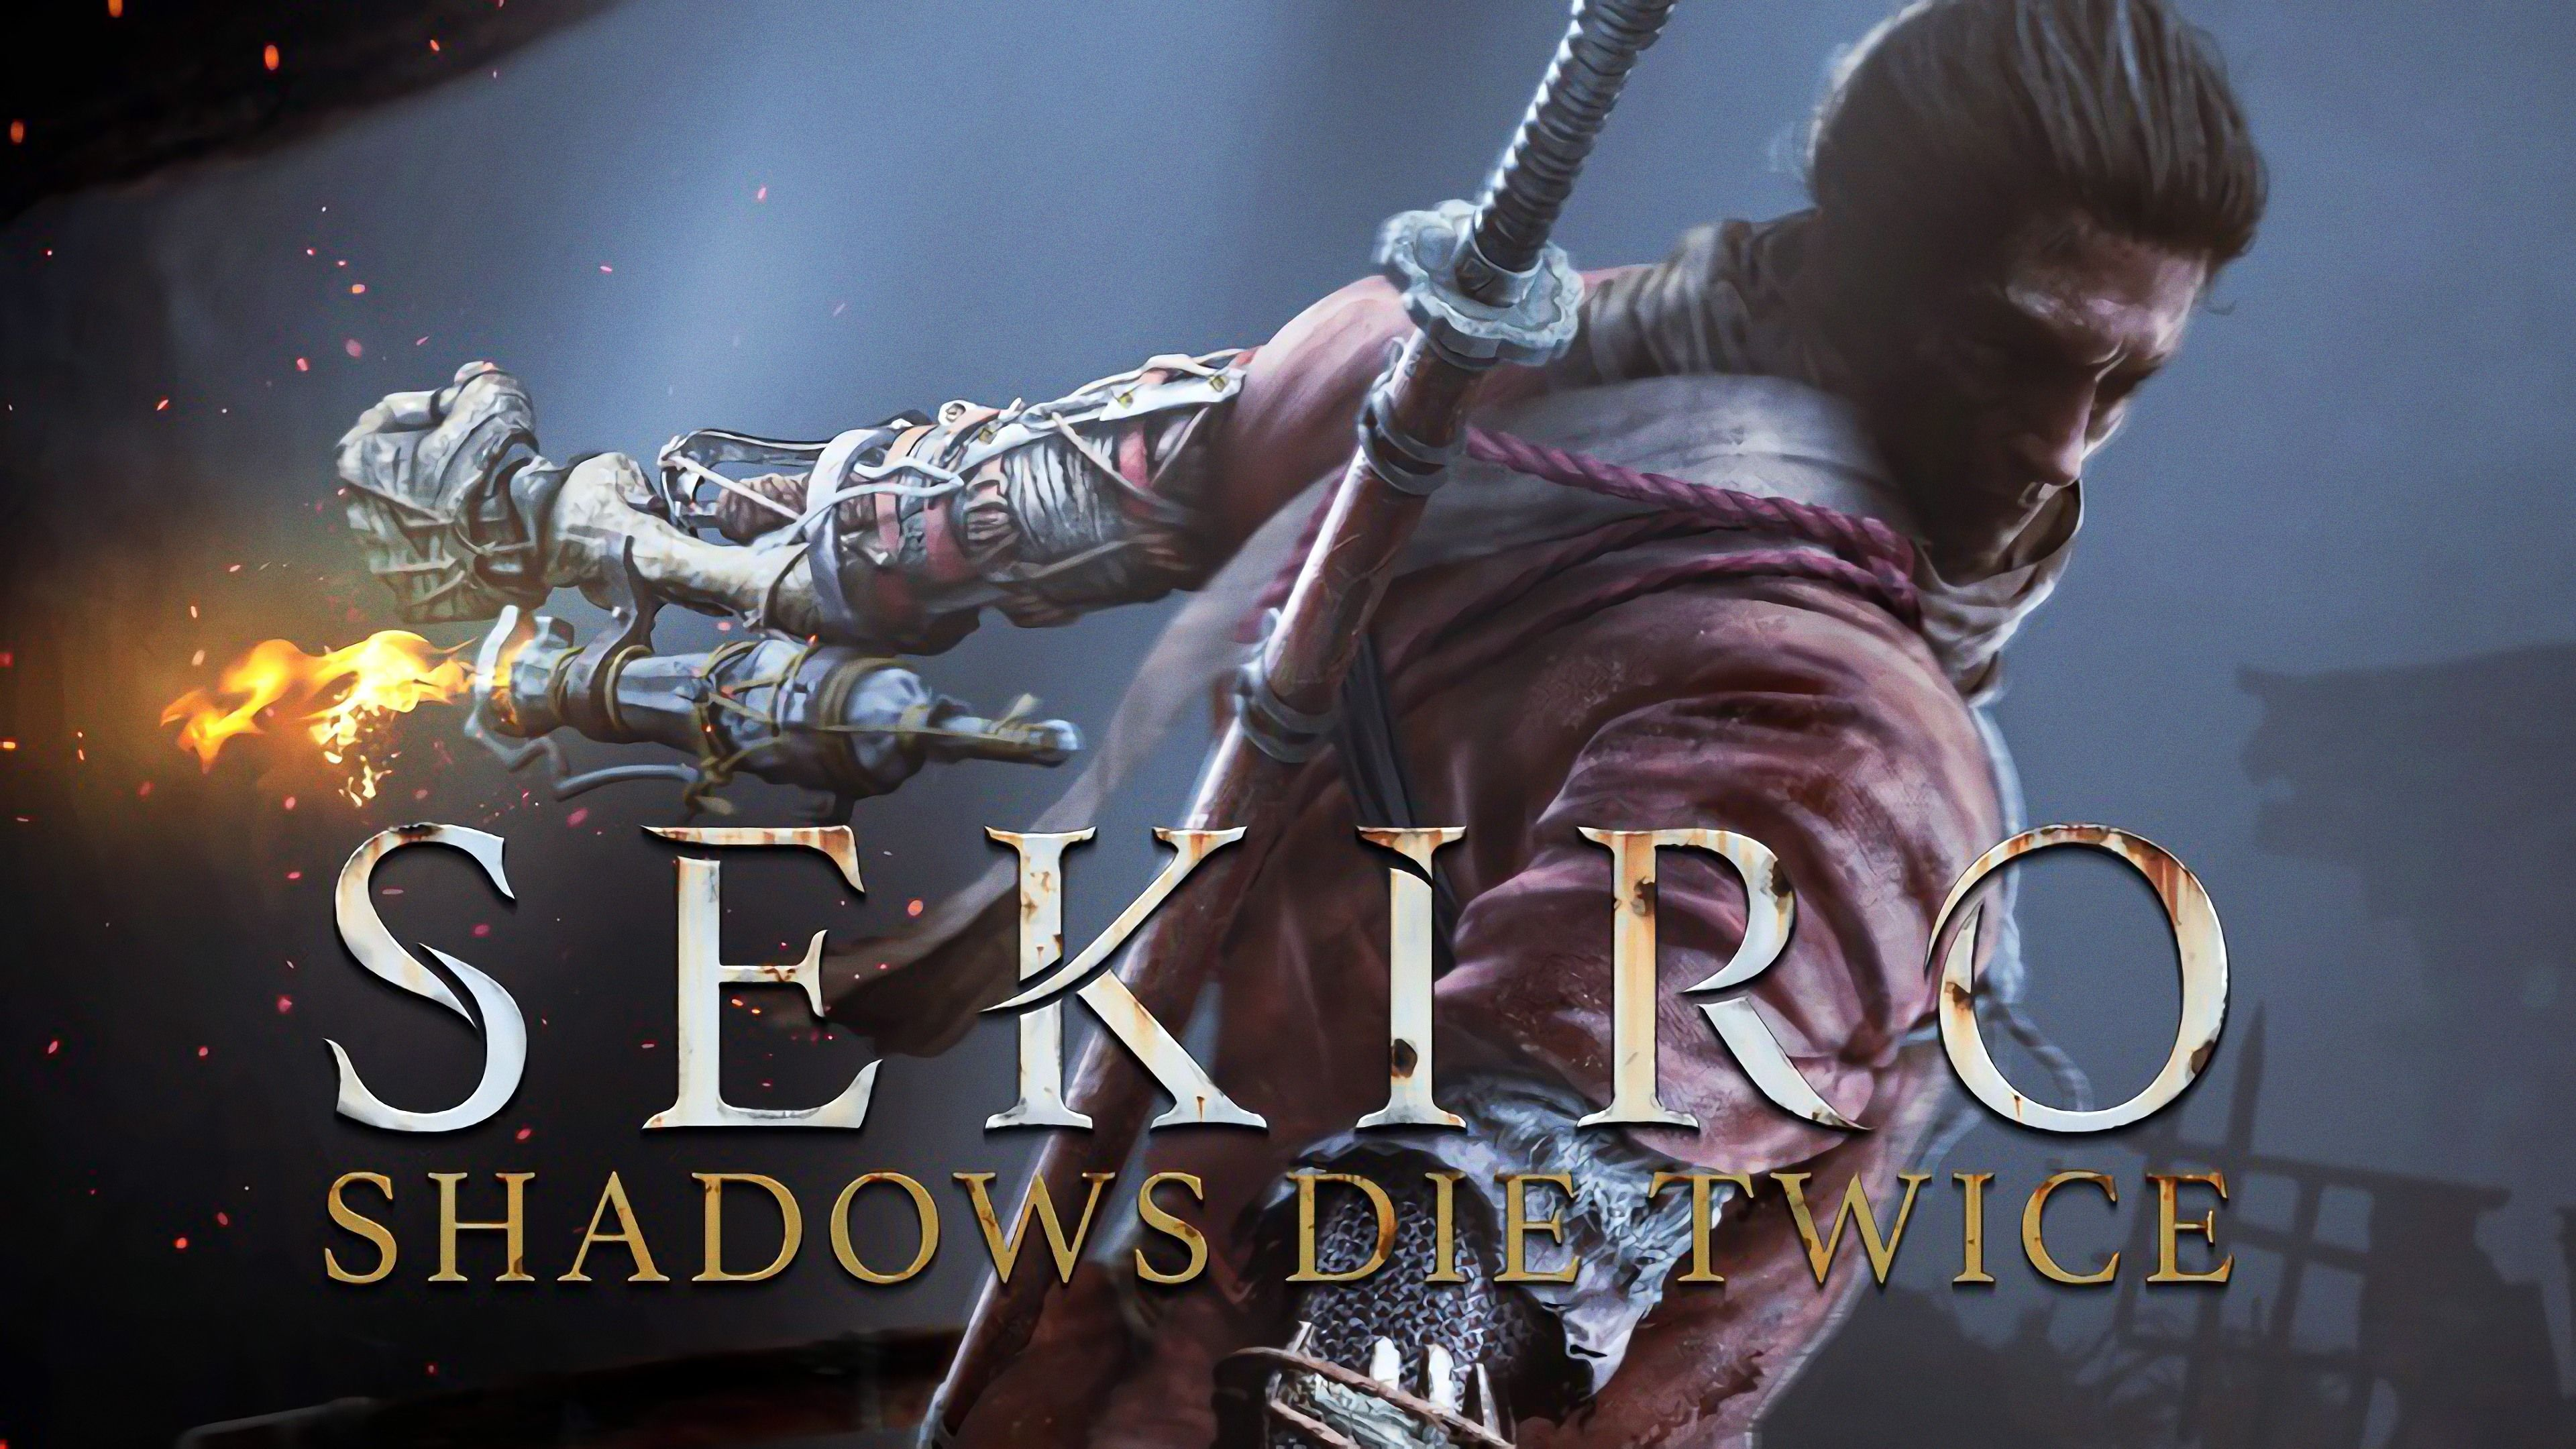 PS4《只狼:影逝二度》年度版10月29日发售 售价约320元